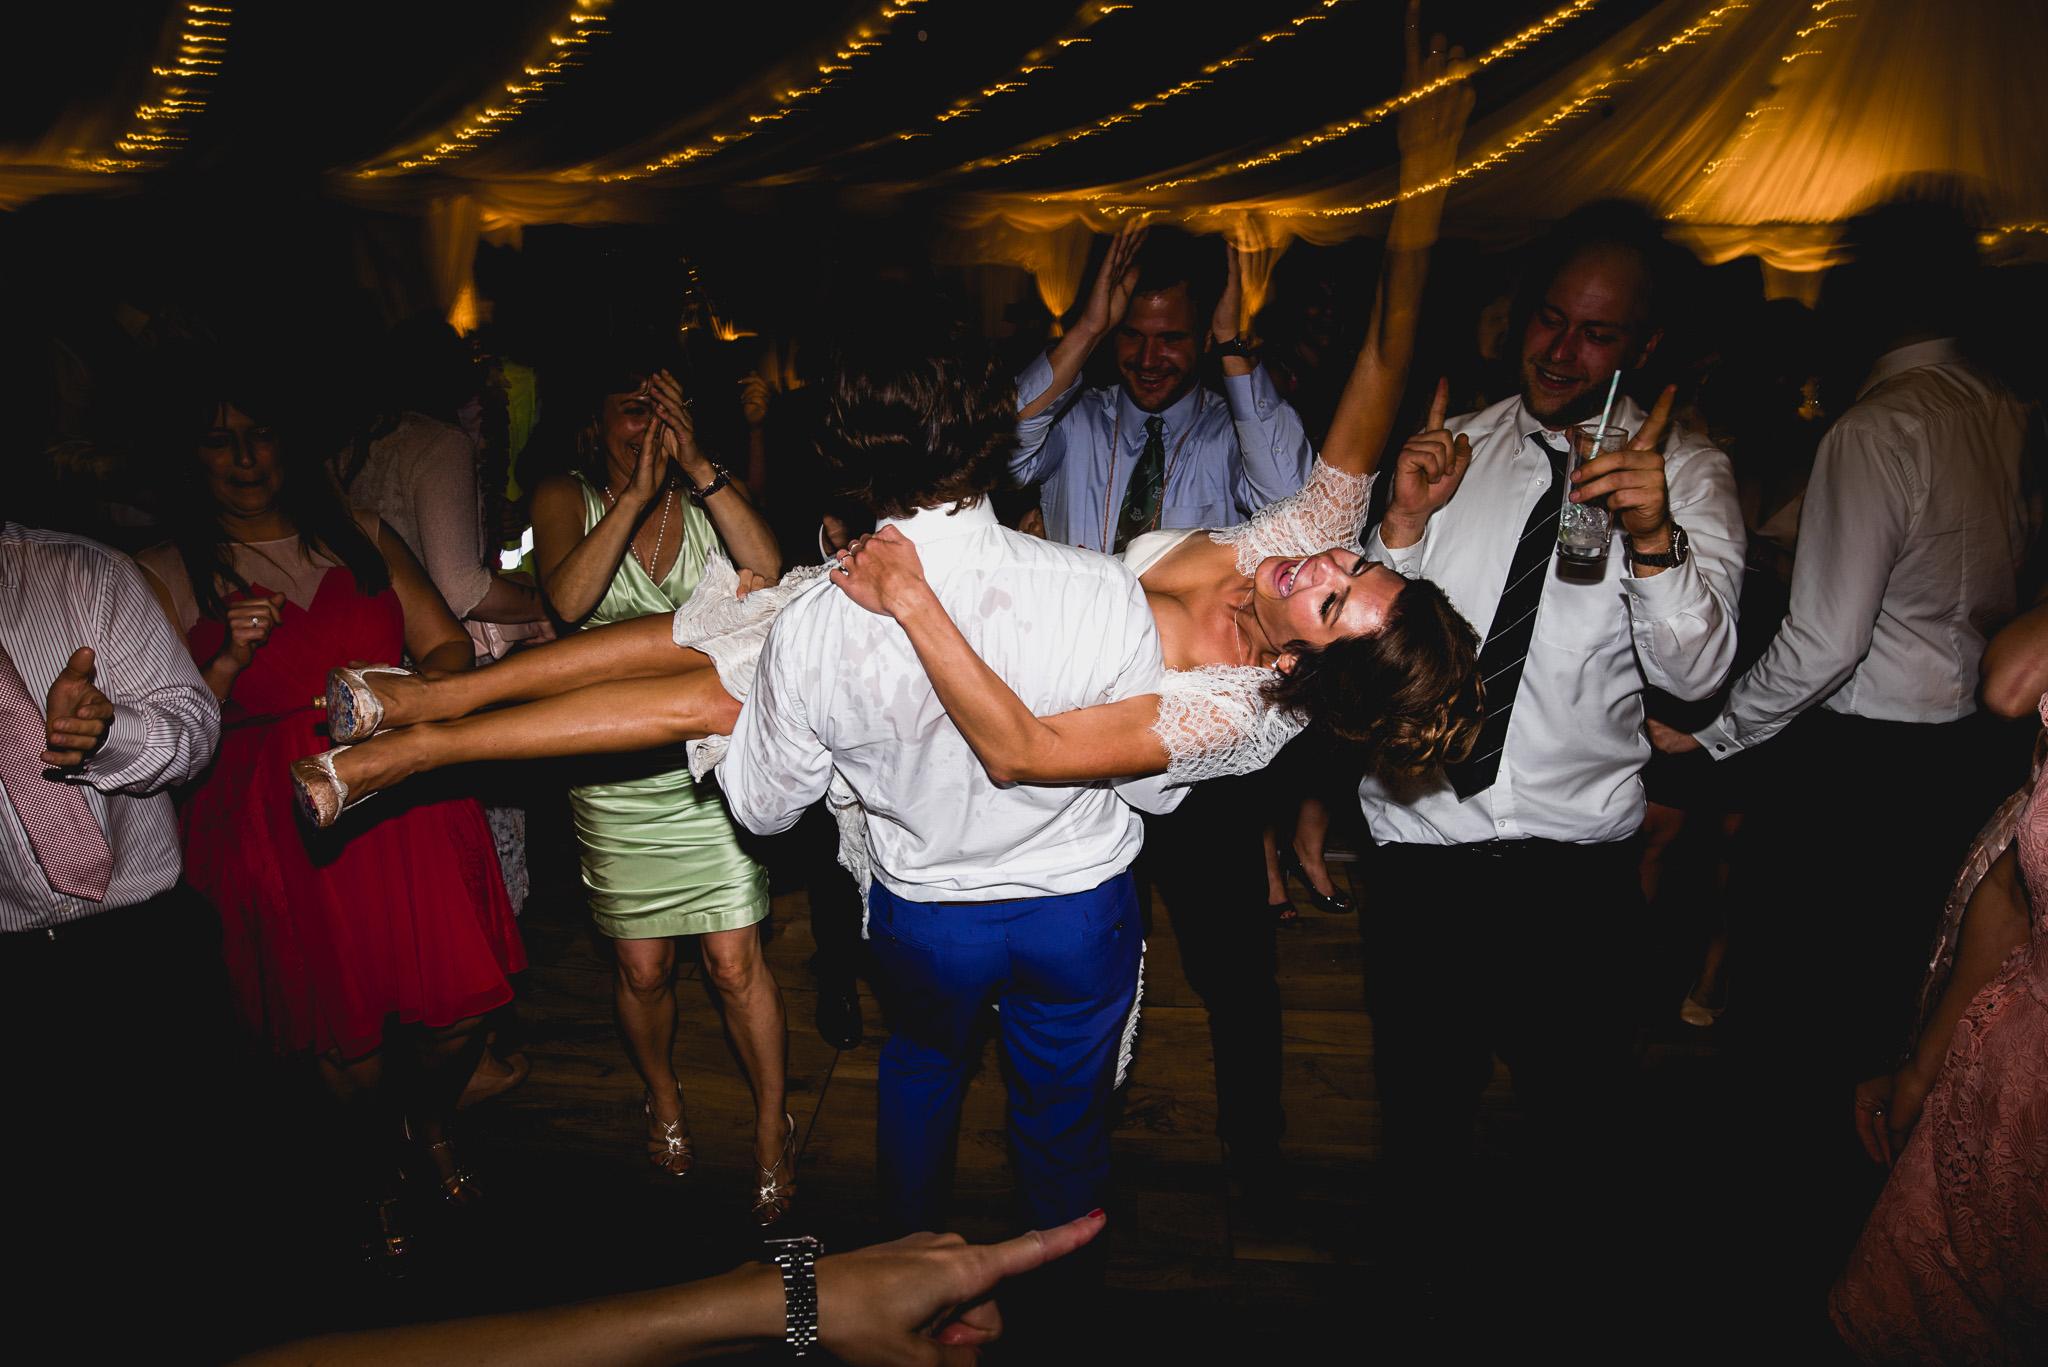 Lara & Jack Wedding 220815 by Barney Walters_1076_BW2_1189